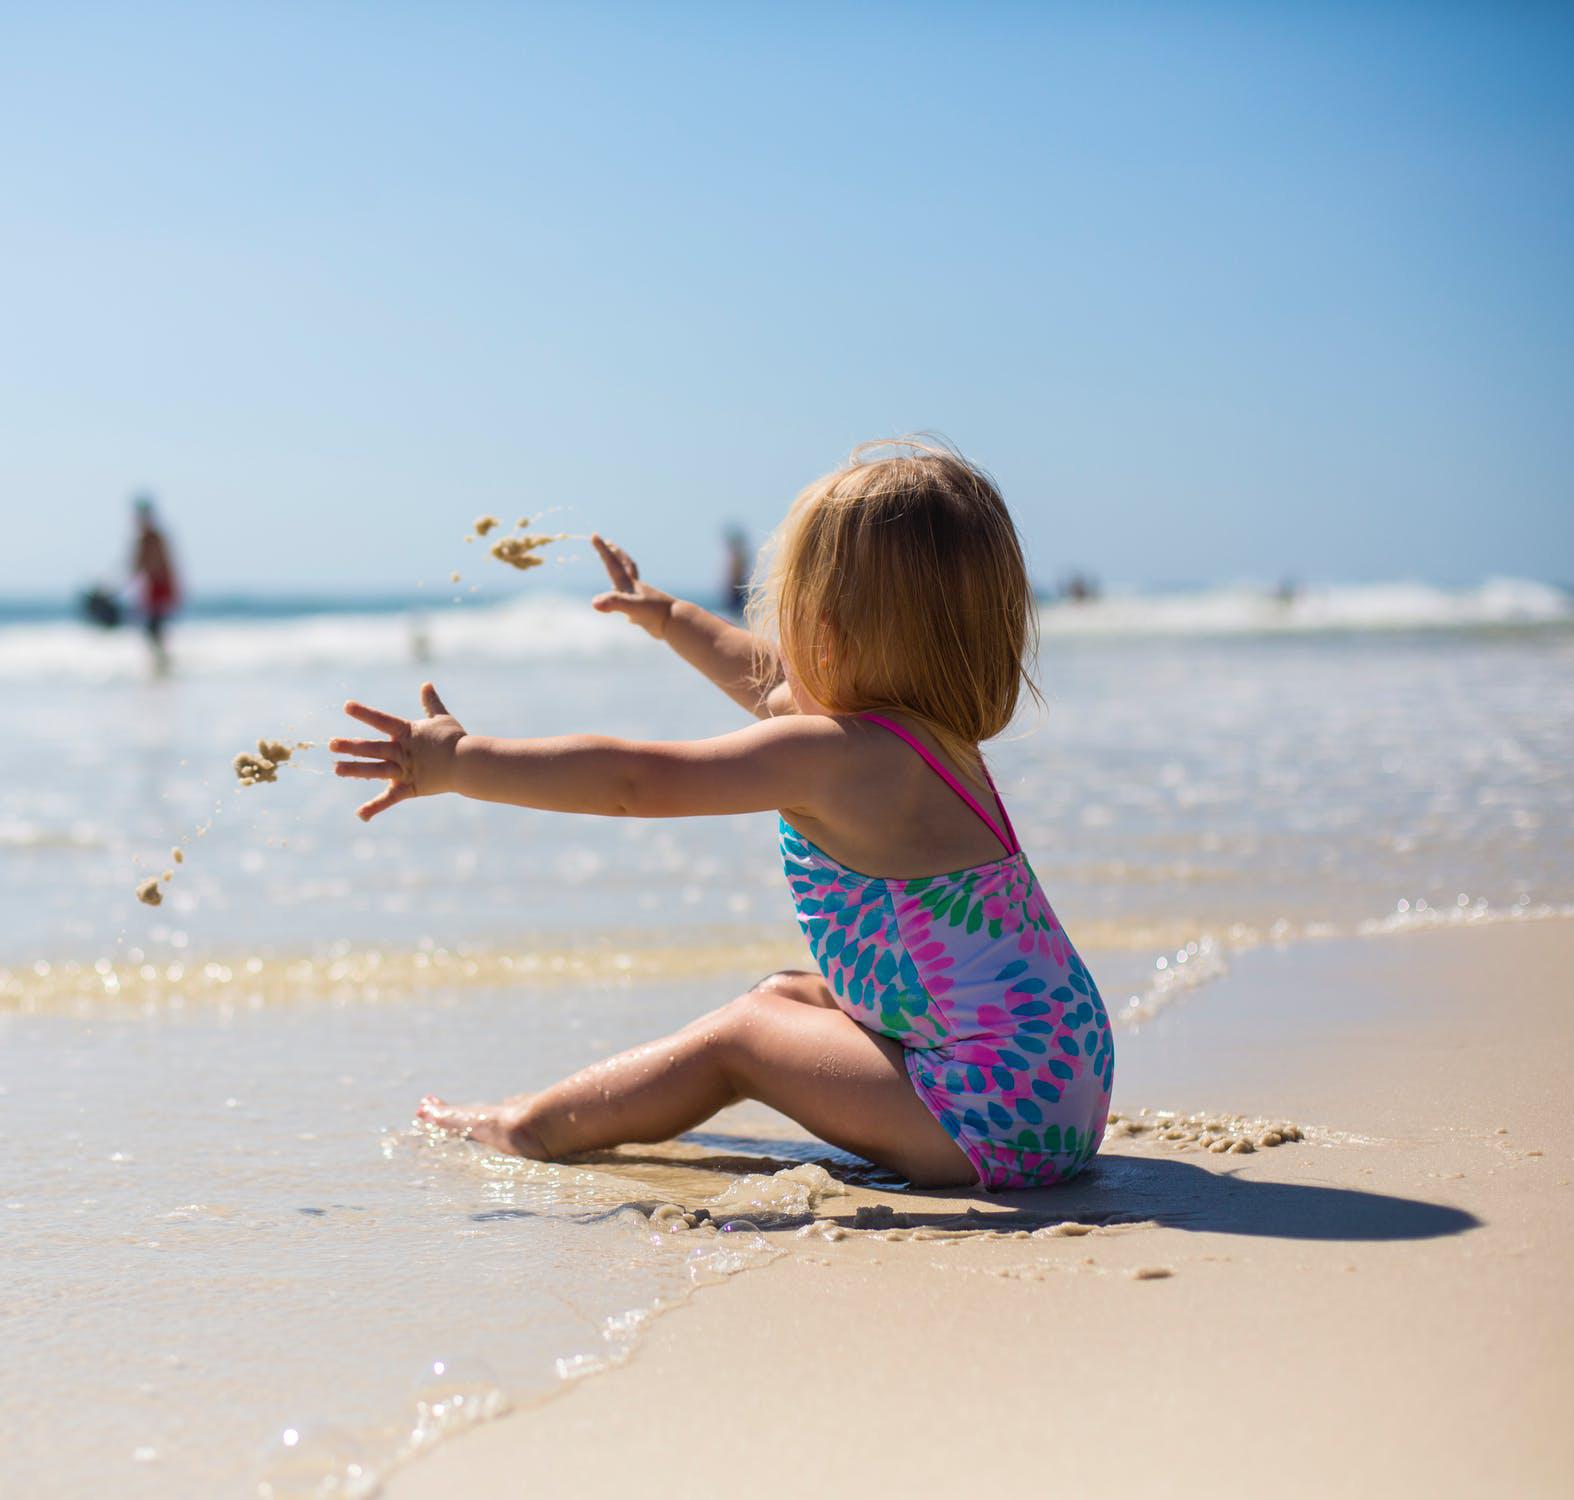 bambina spiaggia piccola